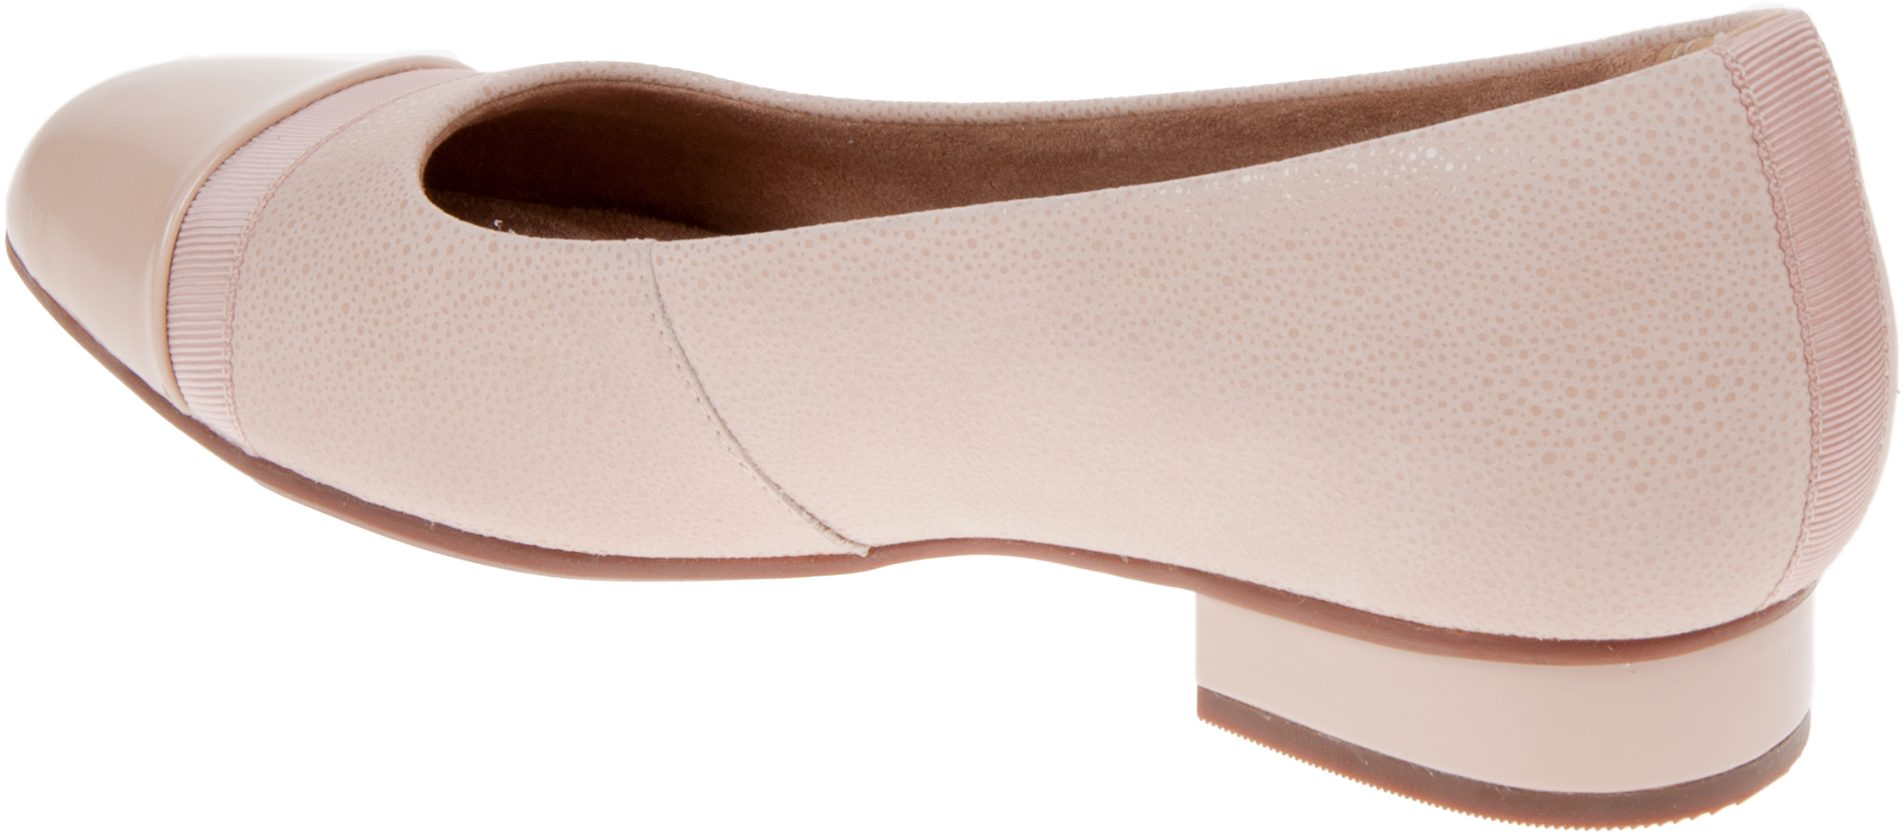 Ladies Clarks Smart Slip On Ballerina Style Pumps Keesha